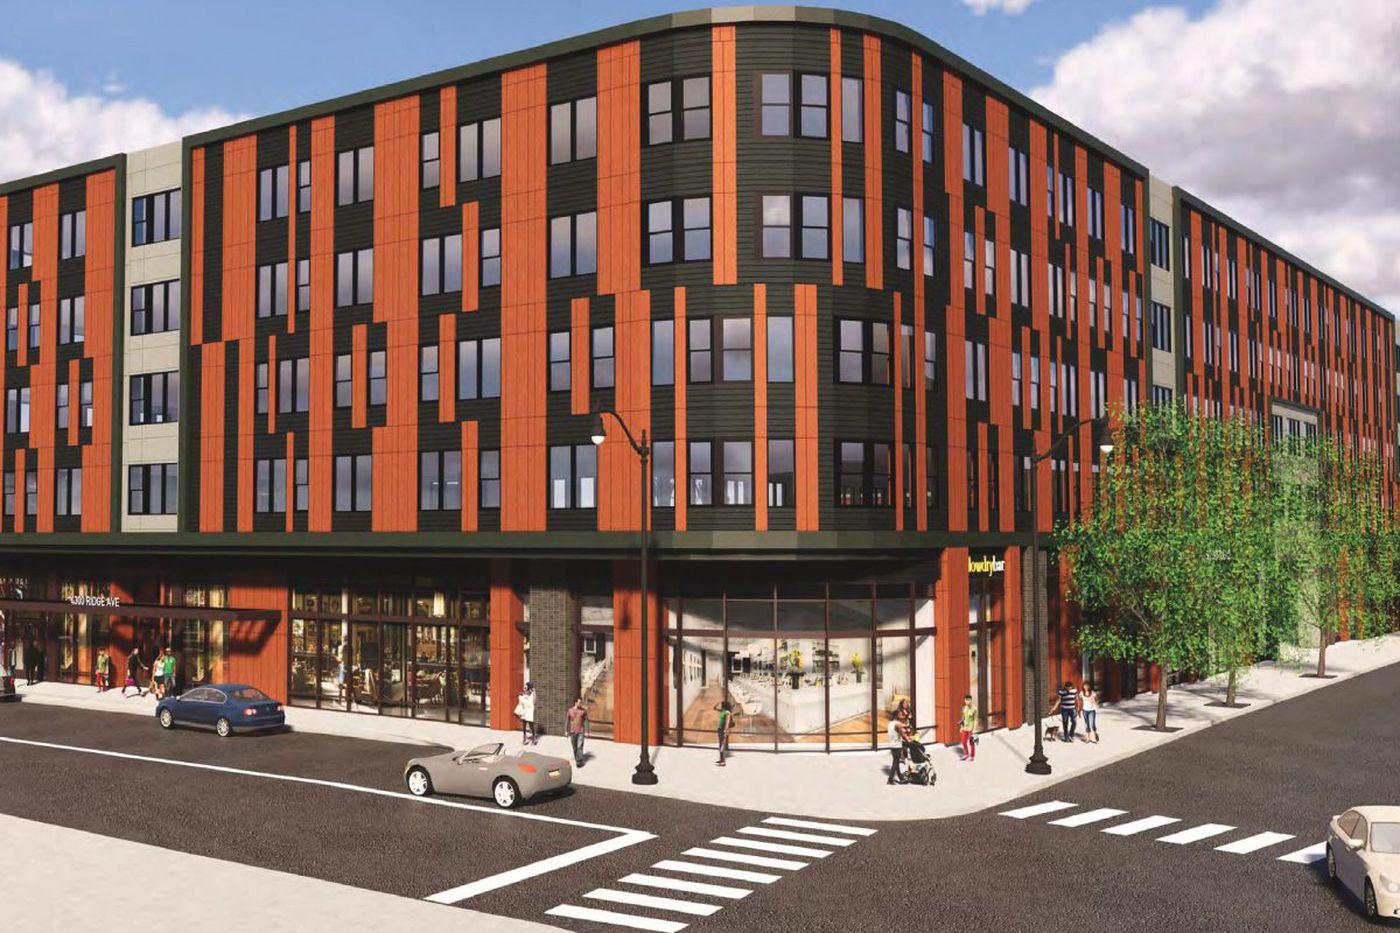 Revised design proposed for 'Ridge Flats' apartment site in East Falls